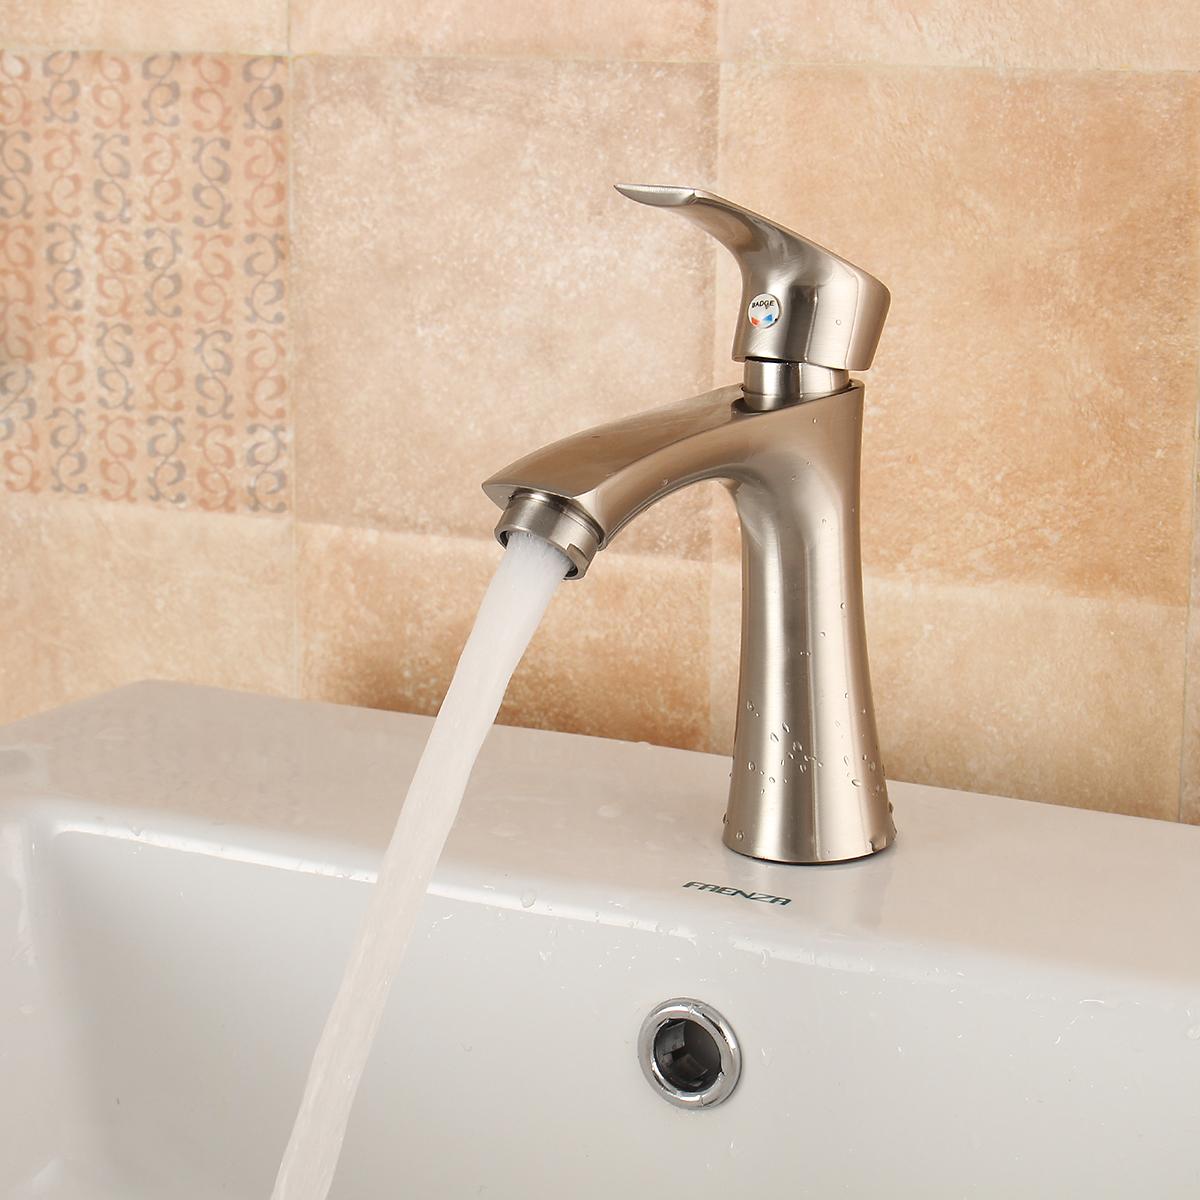 Kvik Mano Salle De Bain ~ tempsa robinet a eau froid en alliage de zinc pr lavabo cascade